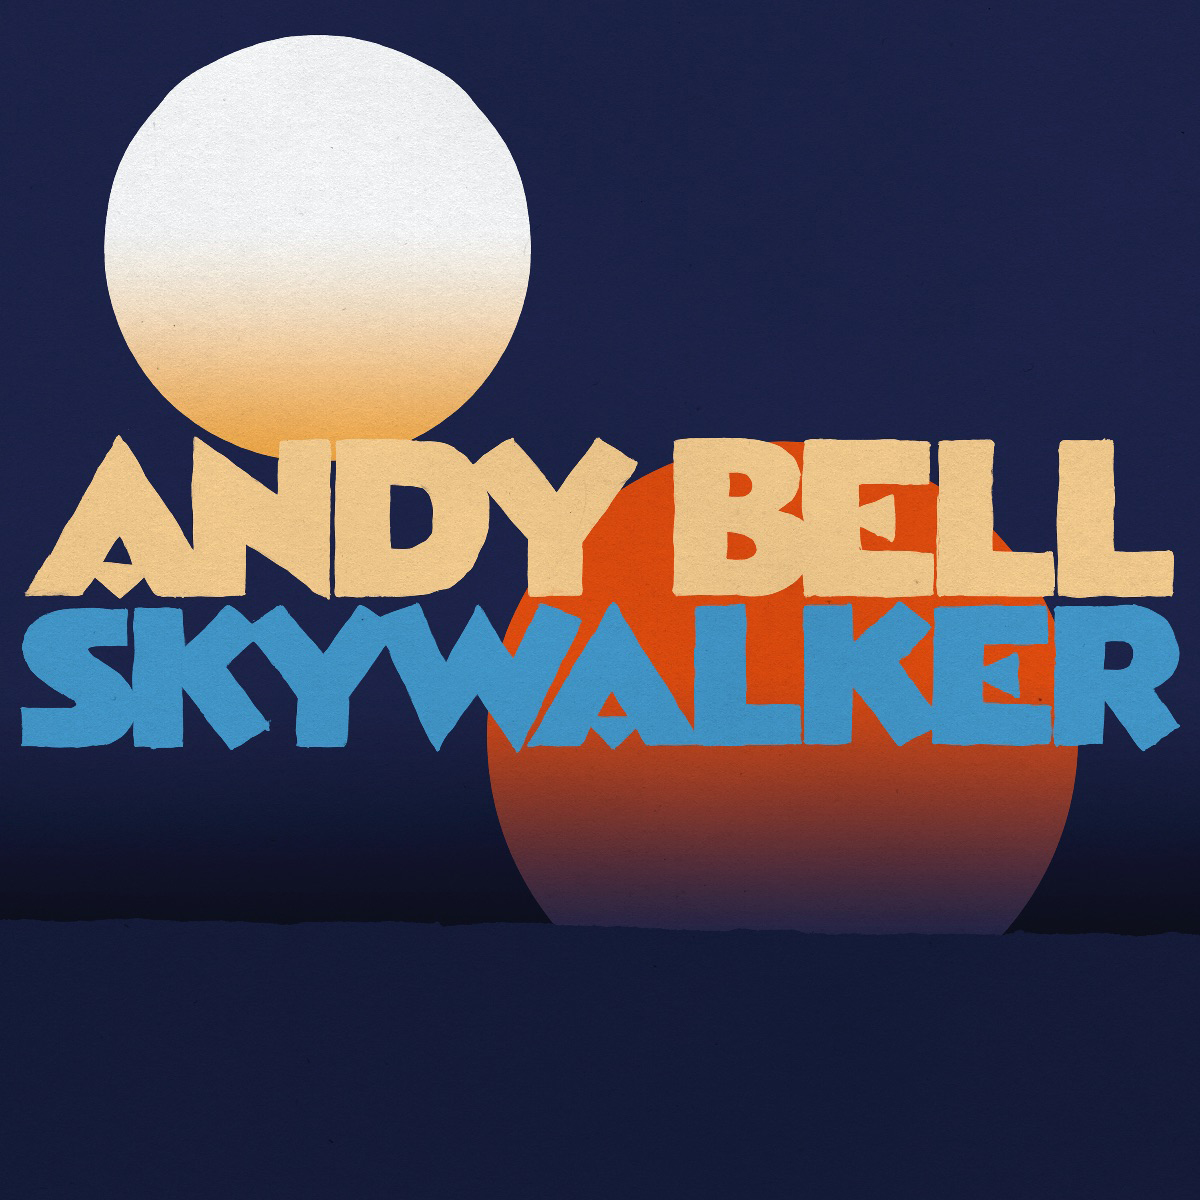 Ride guitarist/singer ANDY BELL releases new single 'Skywalker' - Watch the video by Jean De Oliviera